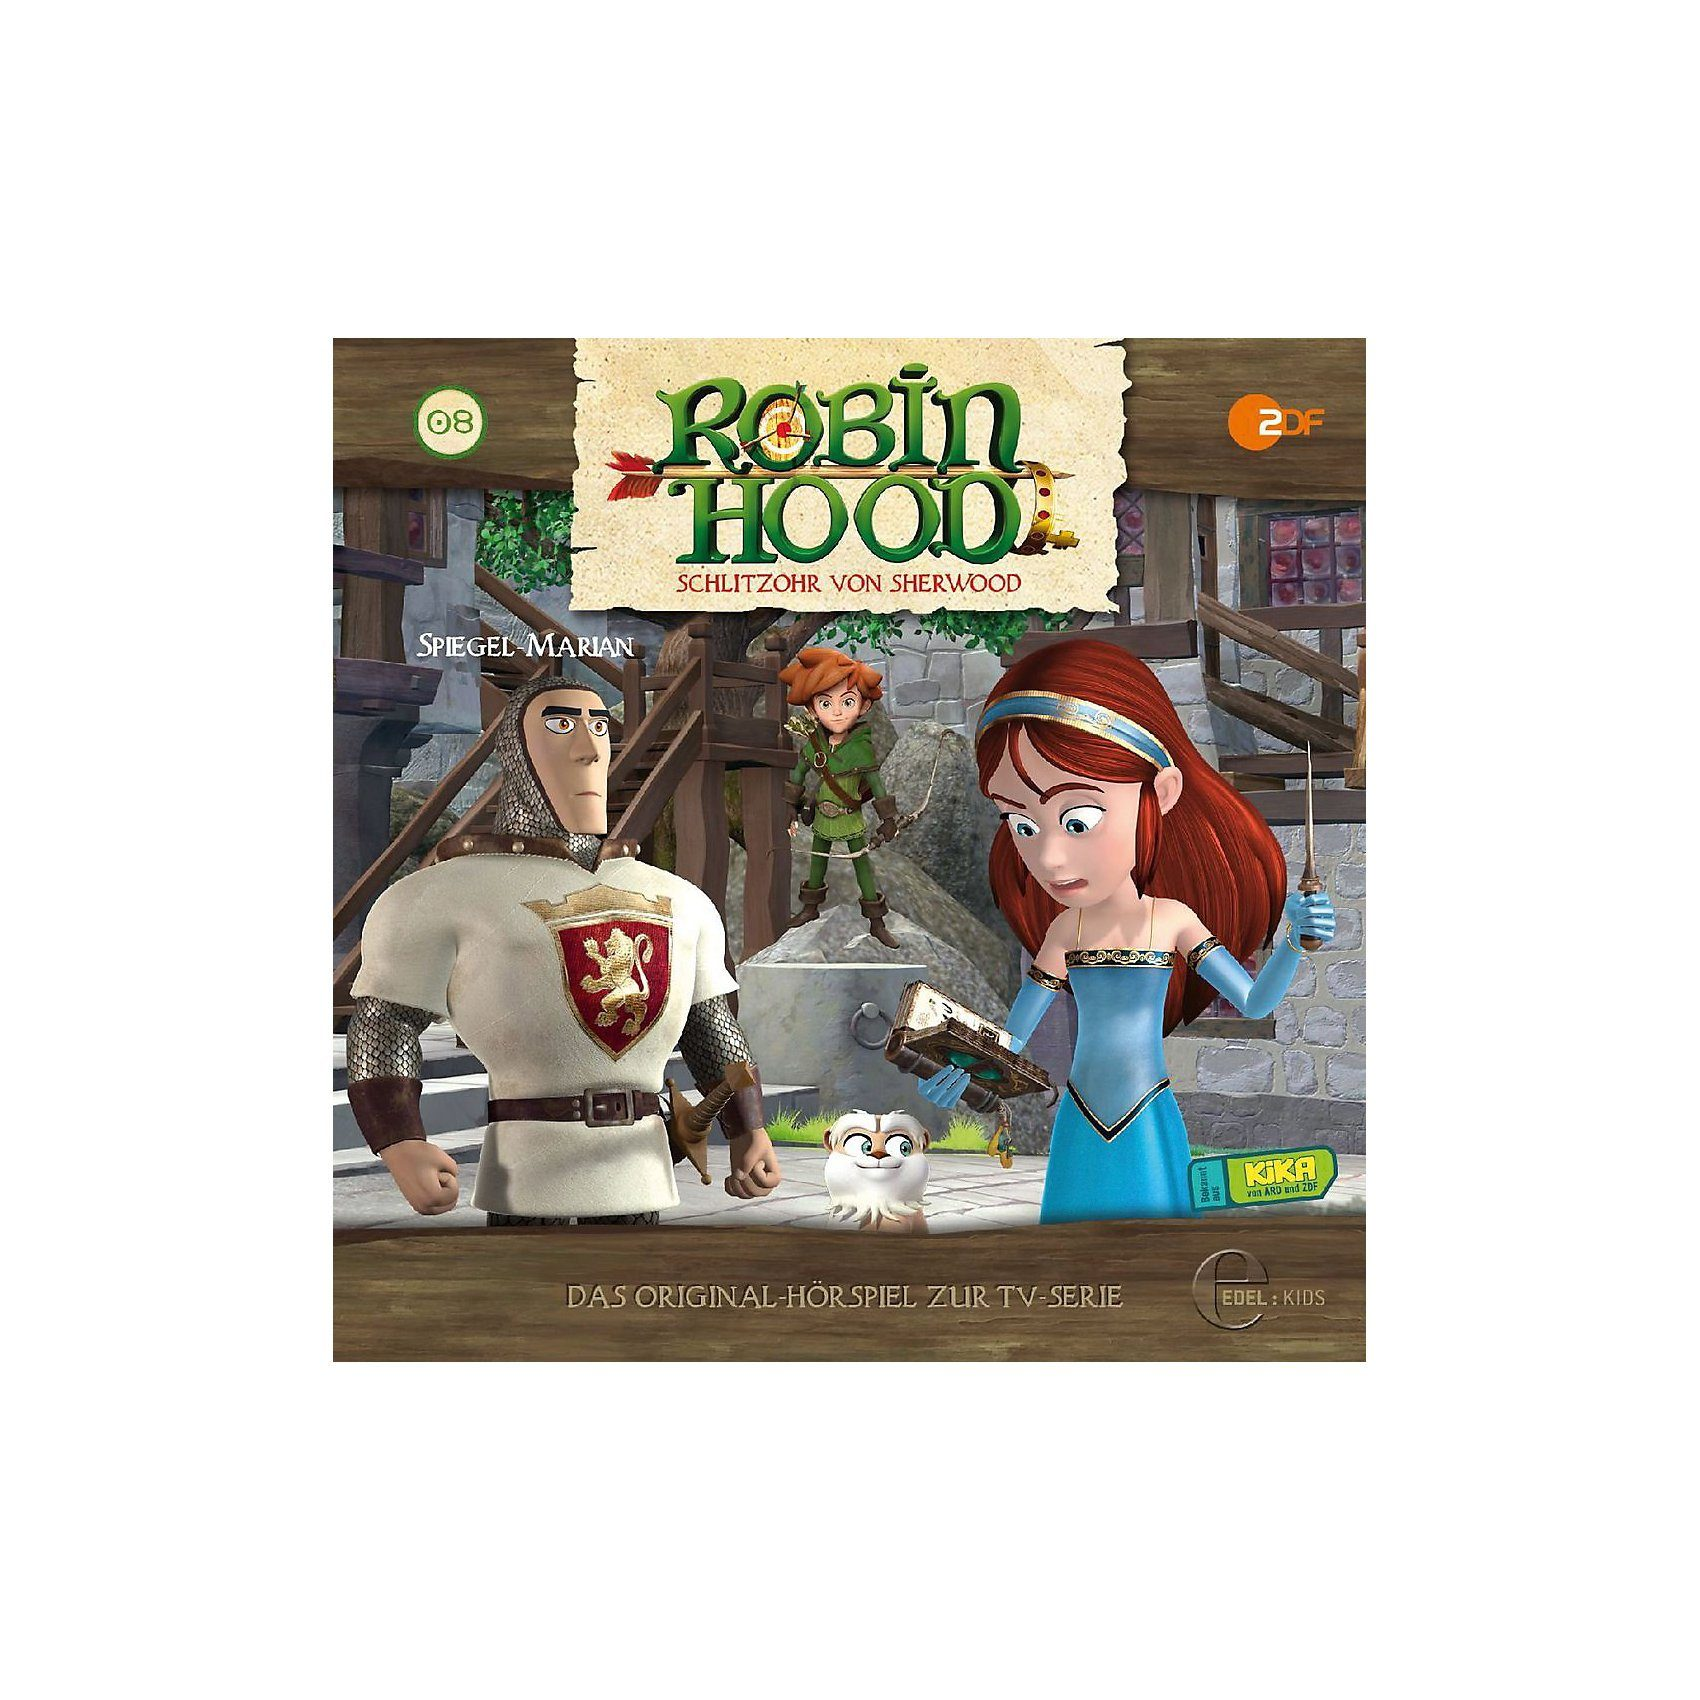 Edel CD Robin Hood-Schlitzohr v.Sherwood 8-Spiegel-Marian